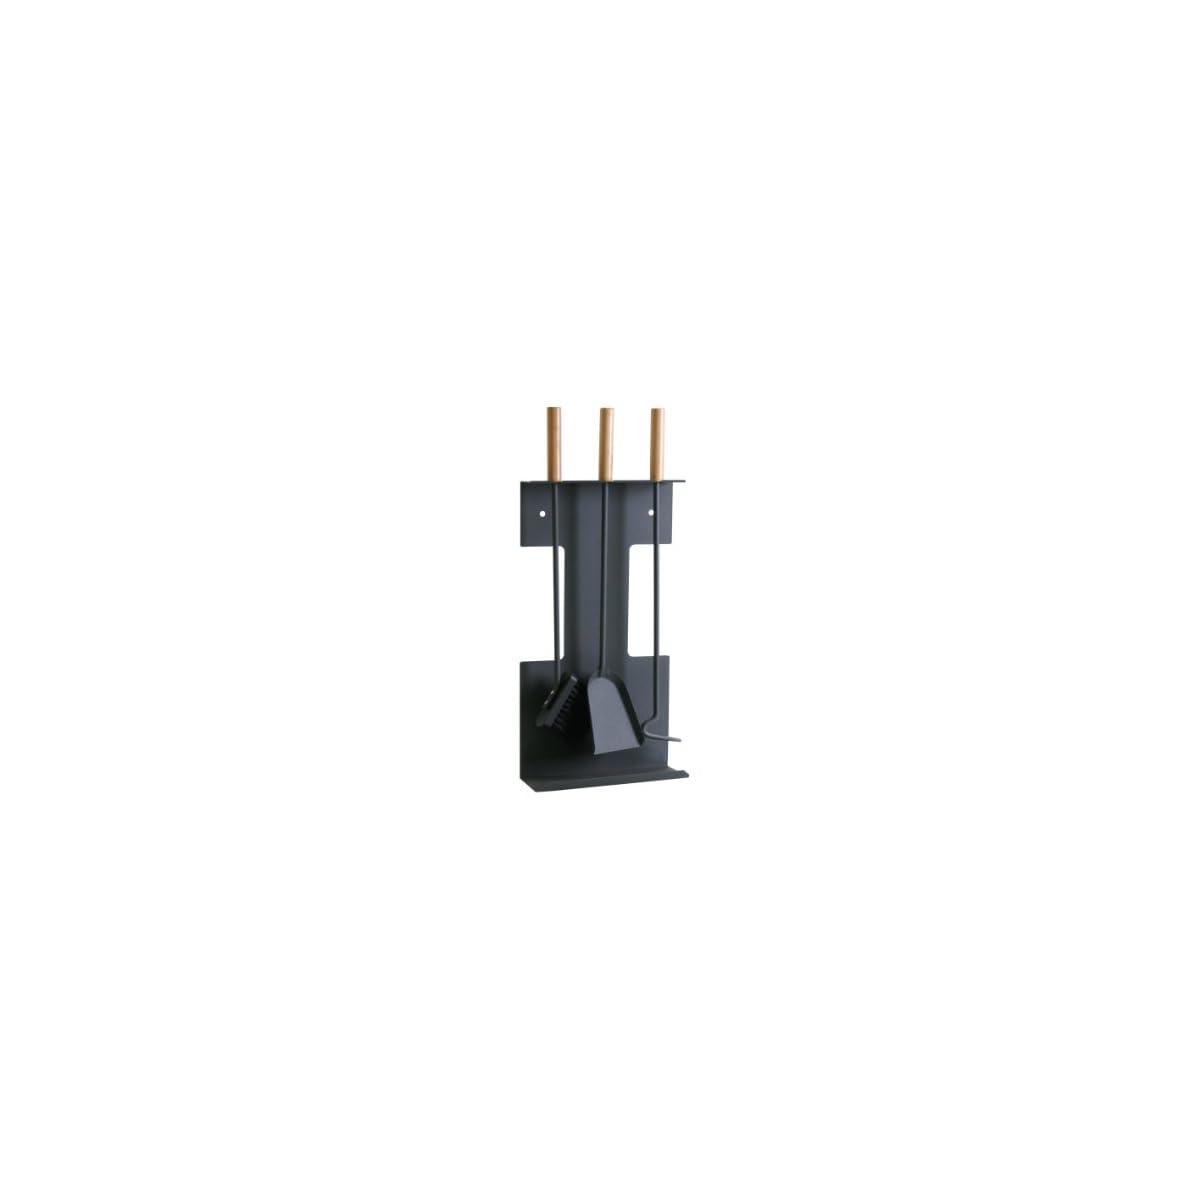 31Qgz%2B%2B0x6L. SS1200  - Kamino-Flam 337132 - Juego de 3 utensilios con mangos de madera, para chimenea